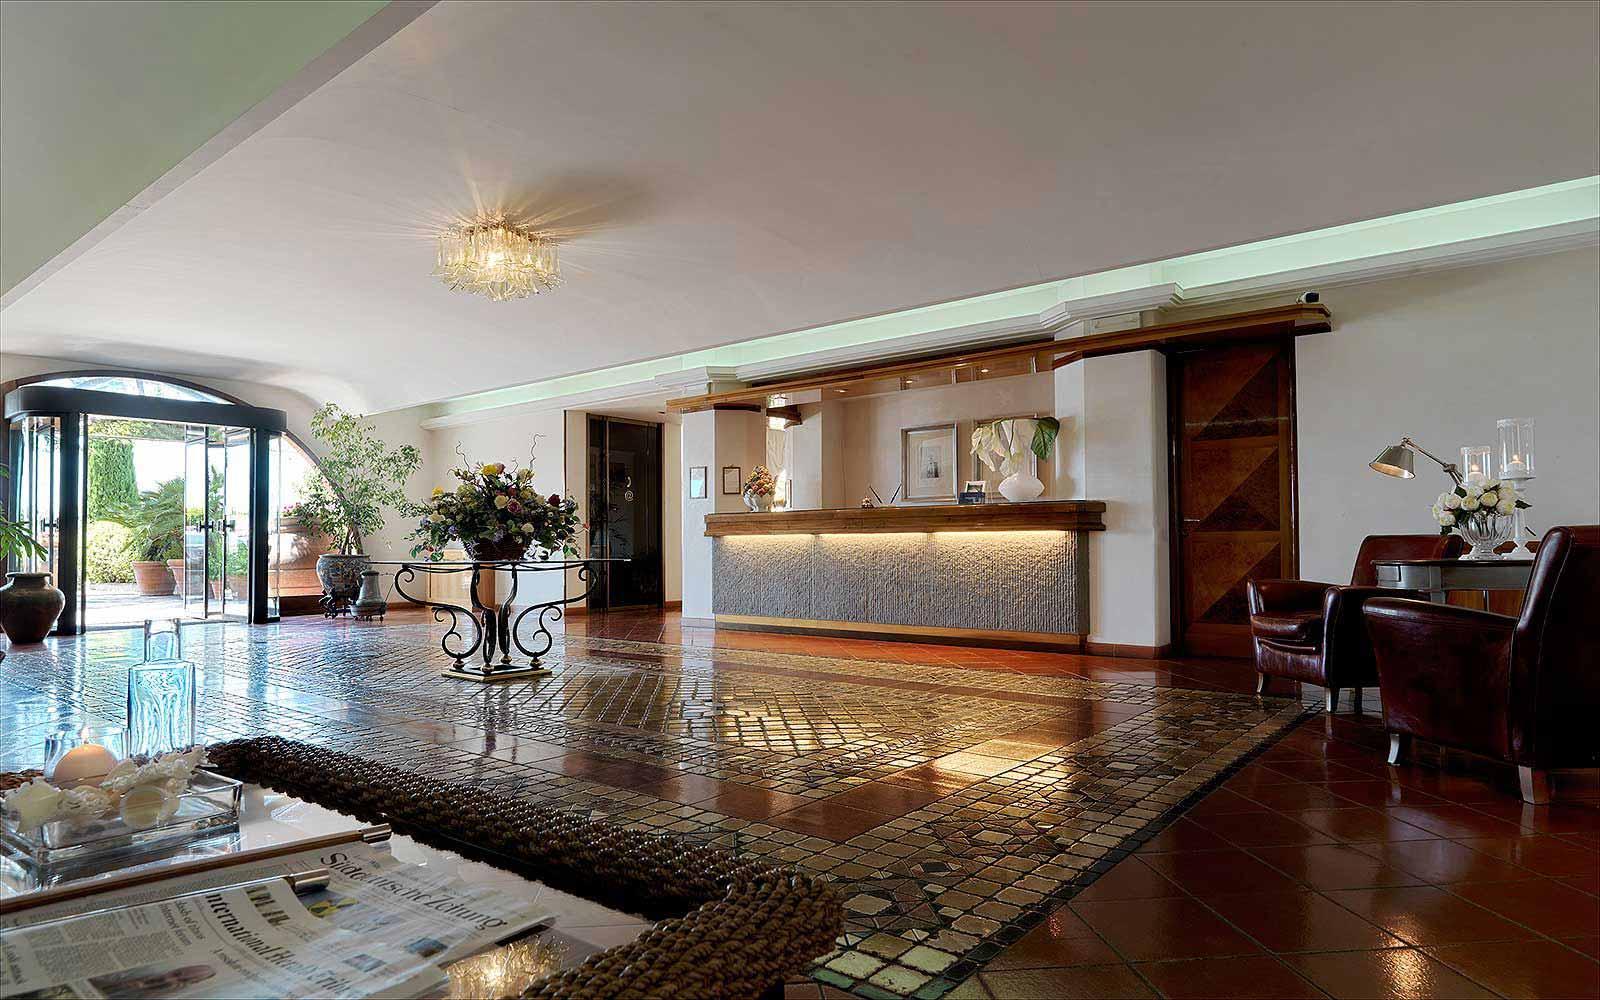 Lobby at Relais Santa Chiara